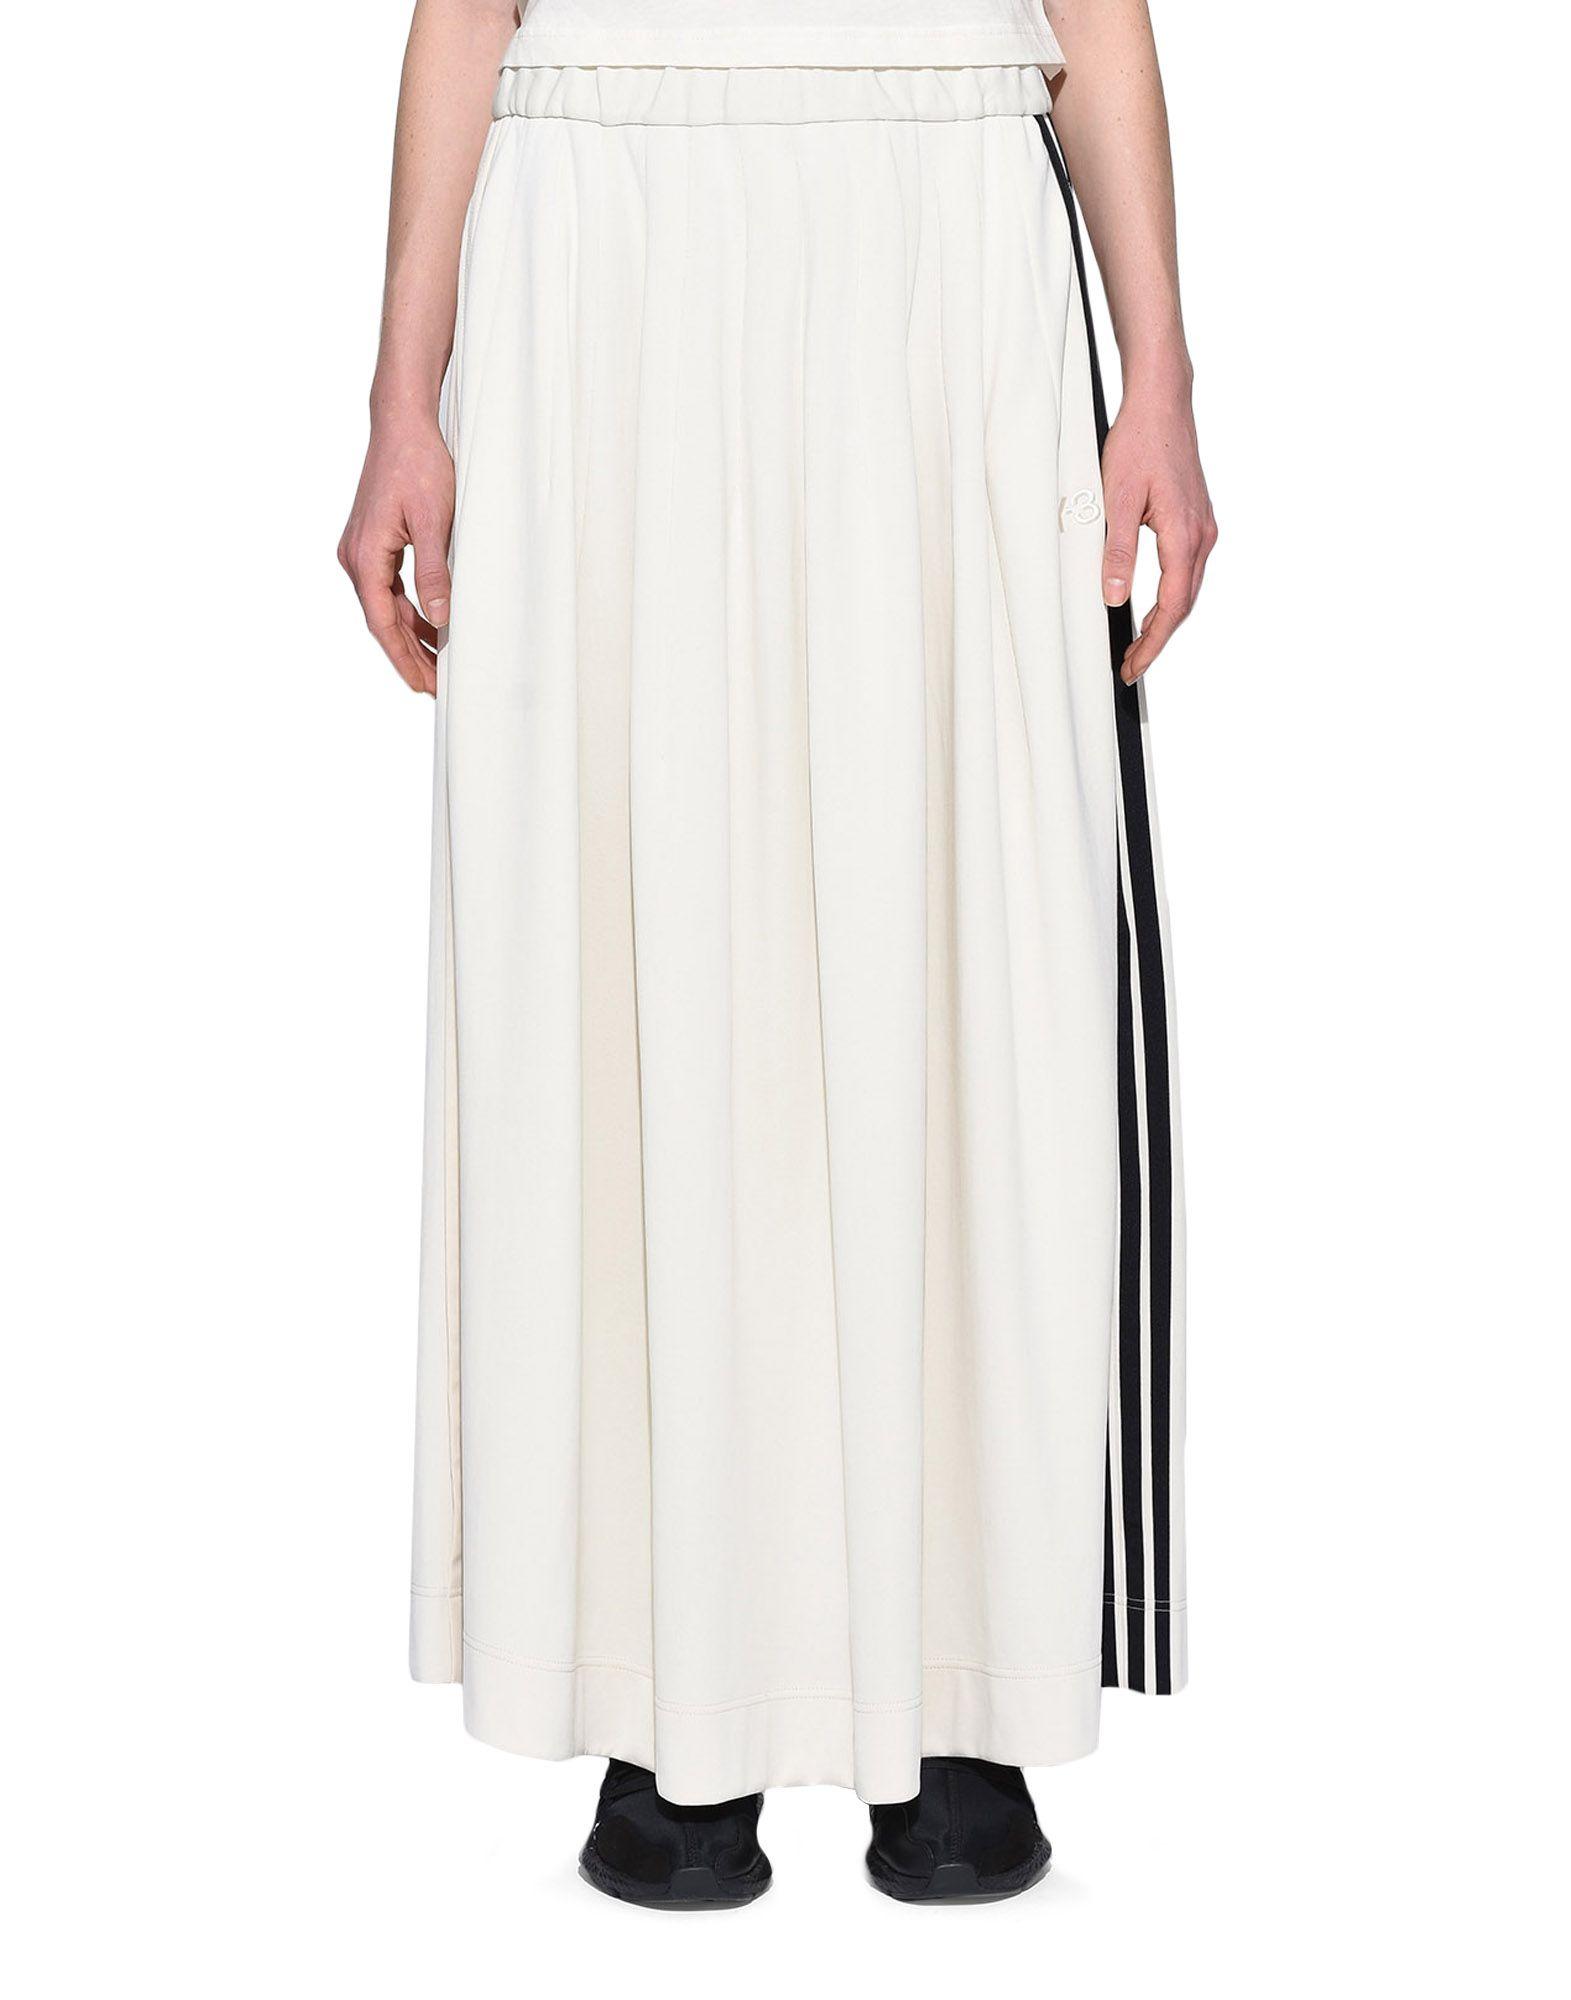 Y-3 Y-3 3-Stripes Selvedge Matte Track Skirt Gonna ginocchio Donna r